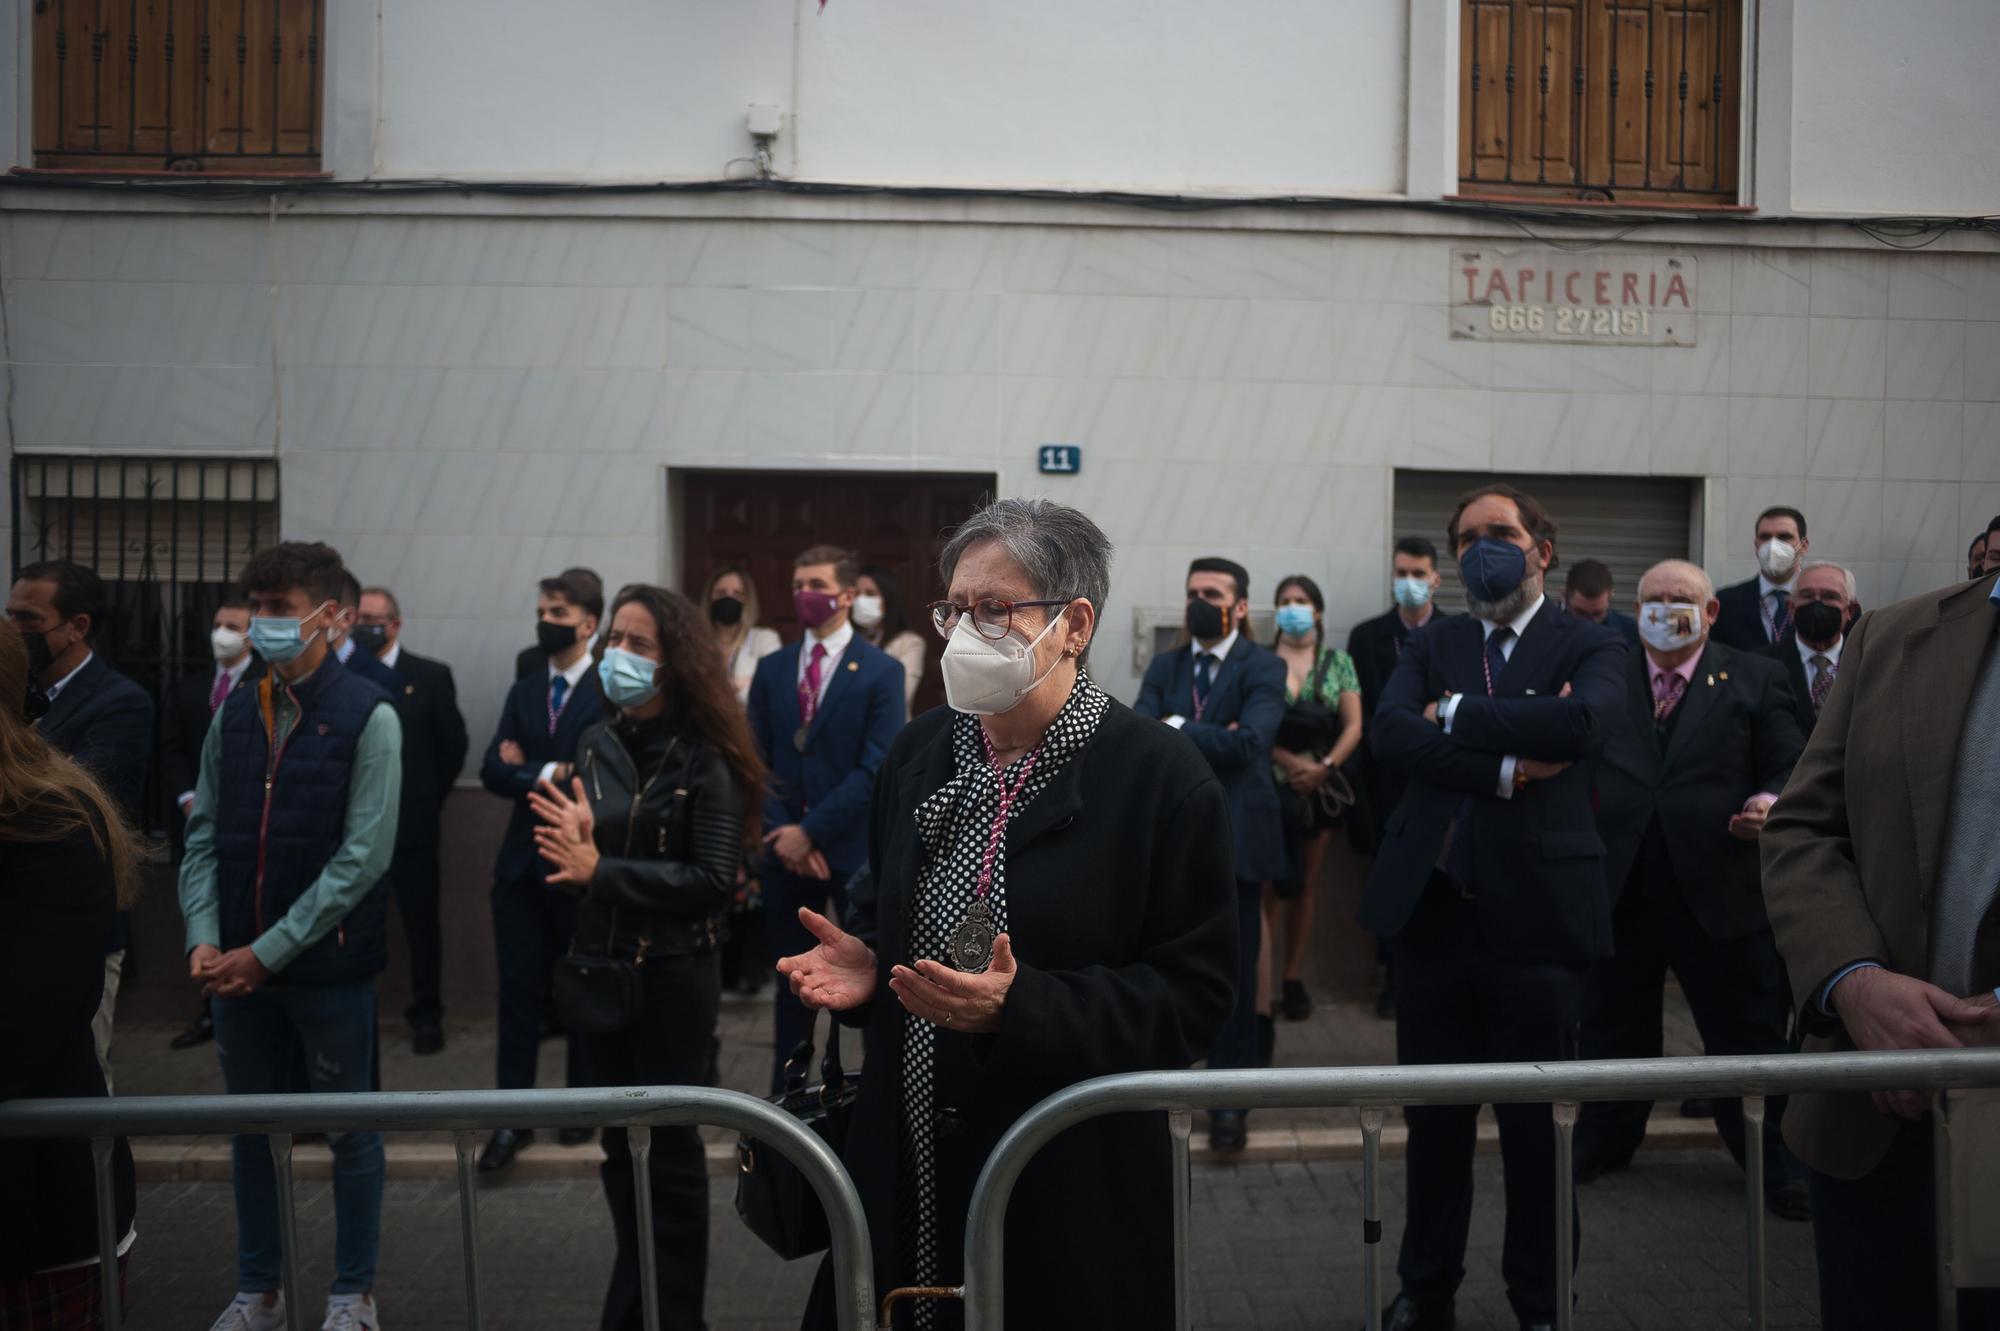 Jon Nazca / Reuters